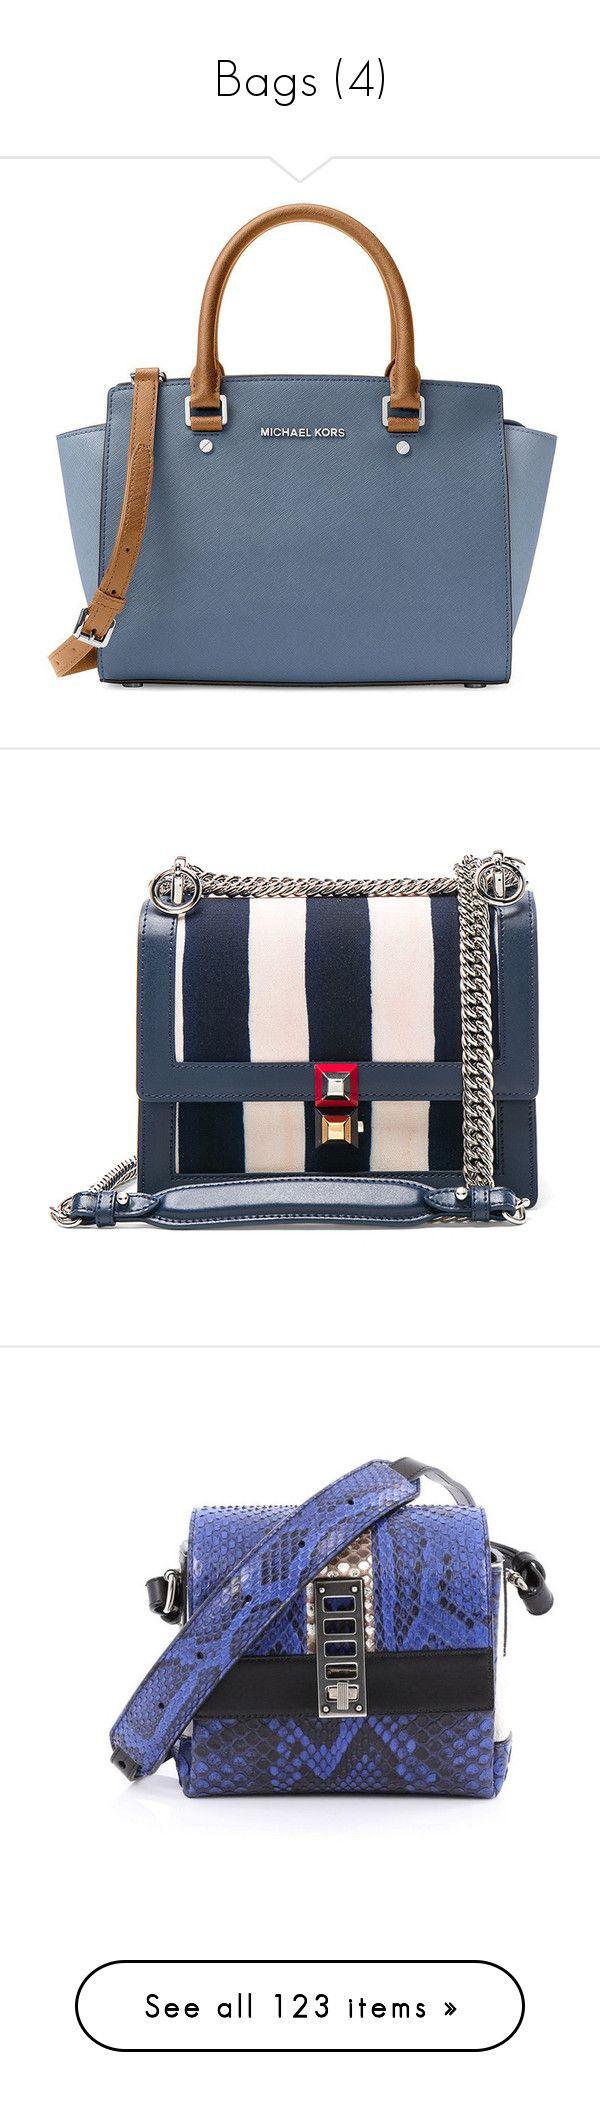 """Bags (4)"" by asia-12 ❤ liked on Polyvore featuring bags, handbags, purses, denim blue, blue handbags, satchel purses, blue satchel, purse satchel, michael michael kors handbags and shoulder bags"